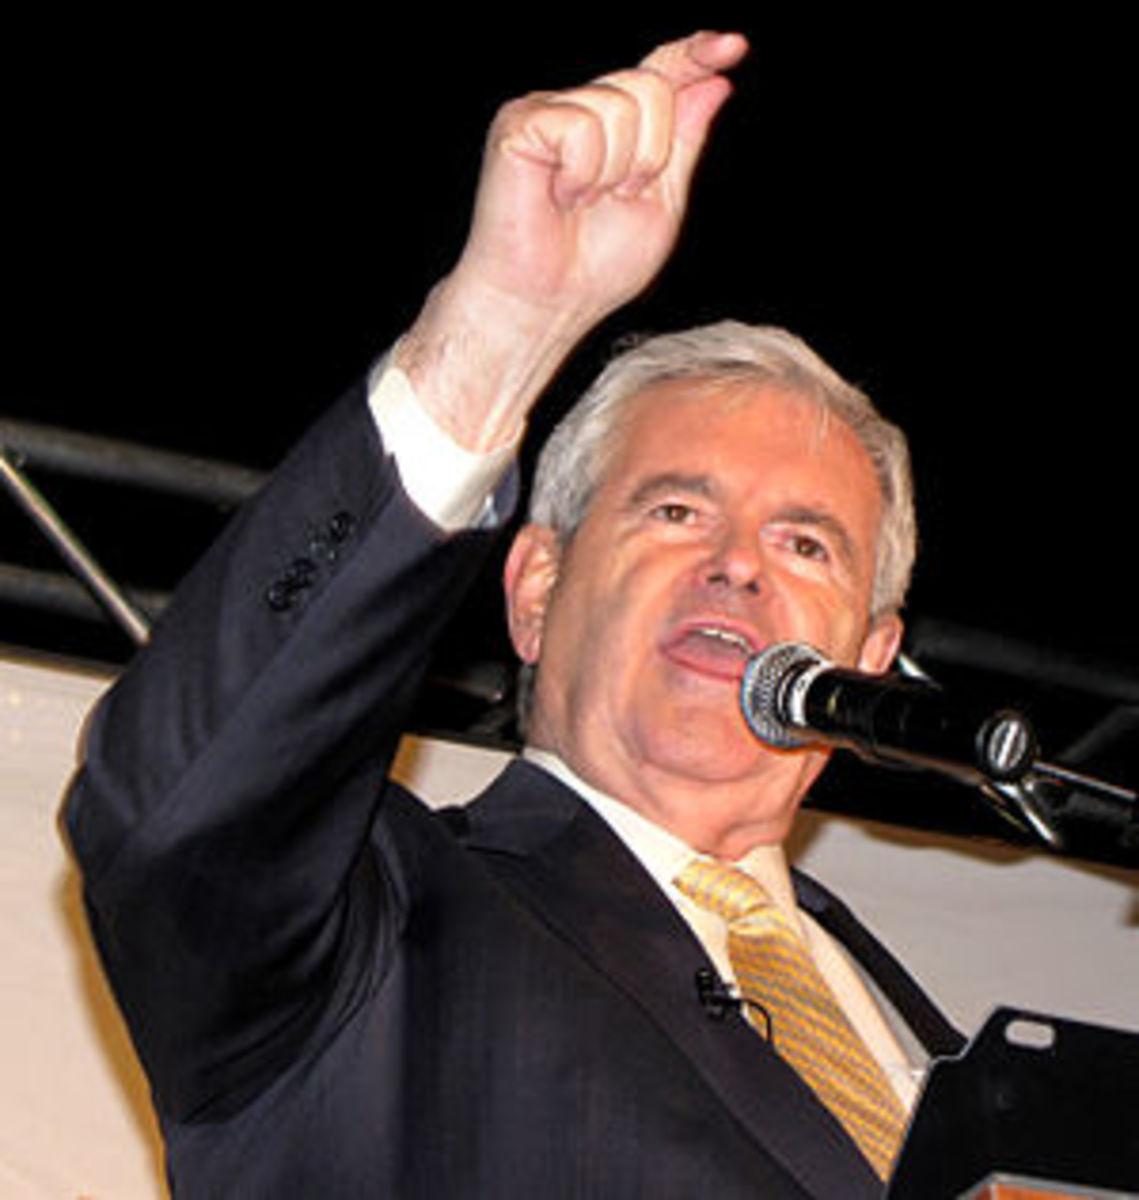 Former Speaker of the House Newt Gingrich spea...